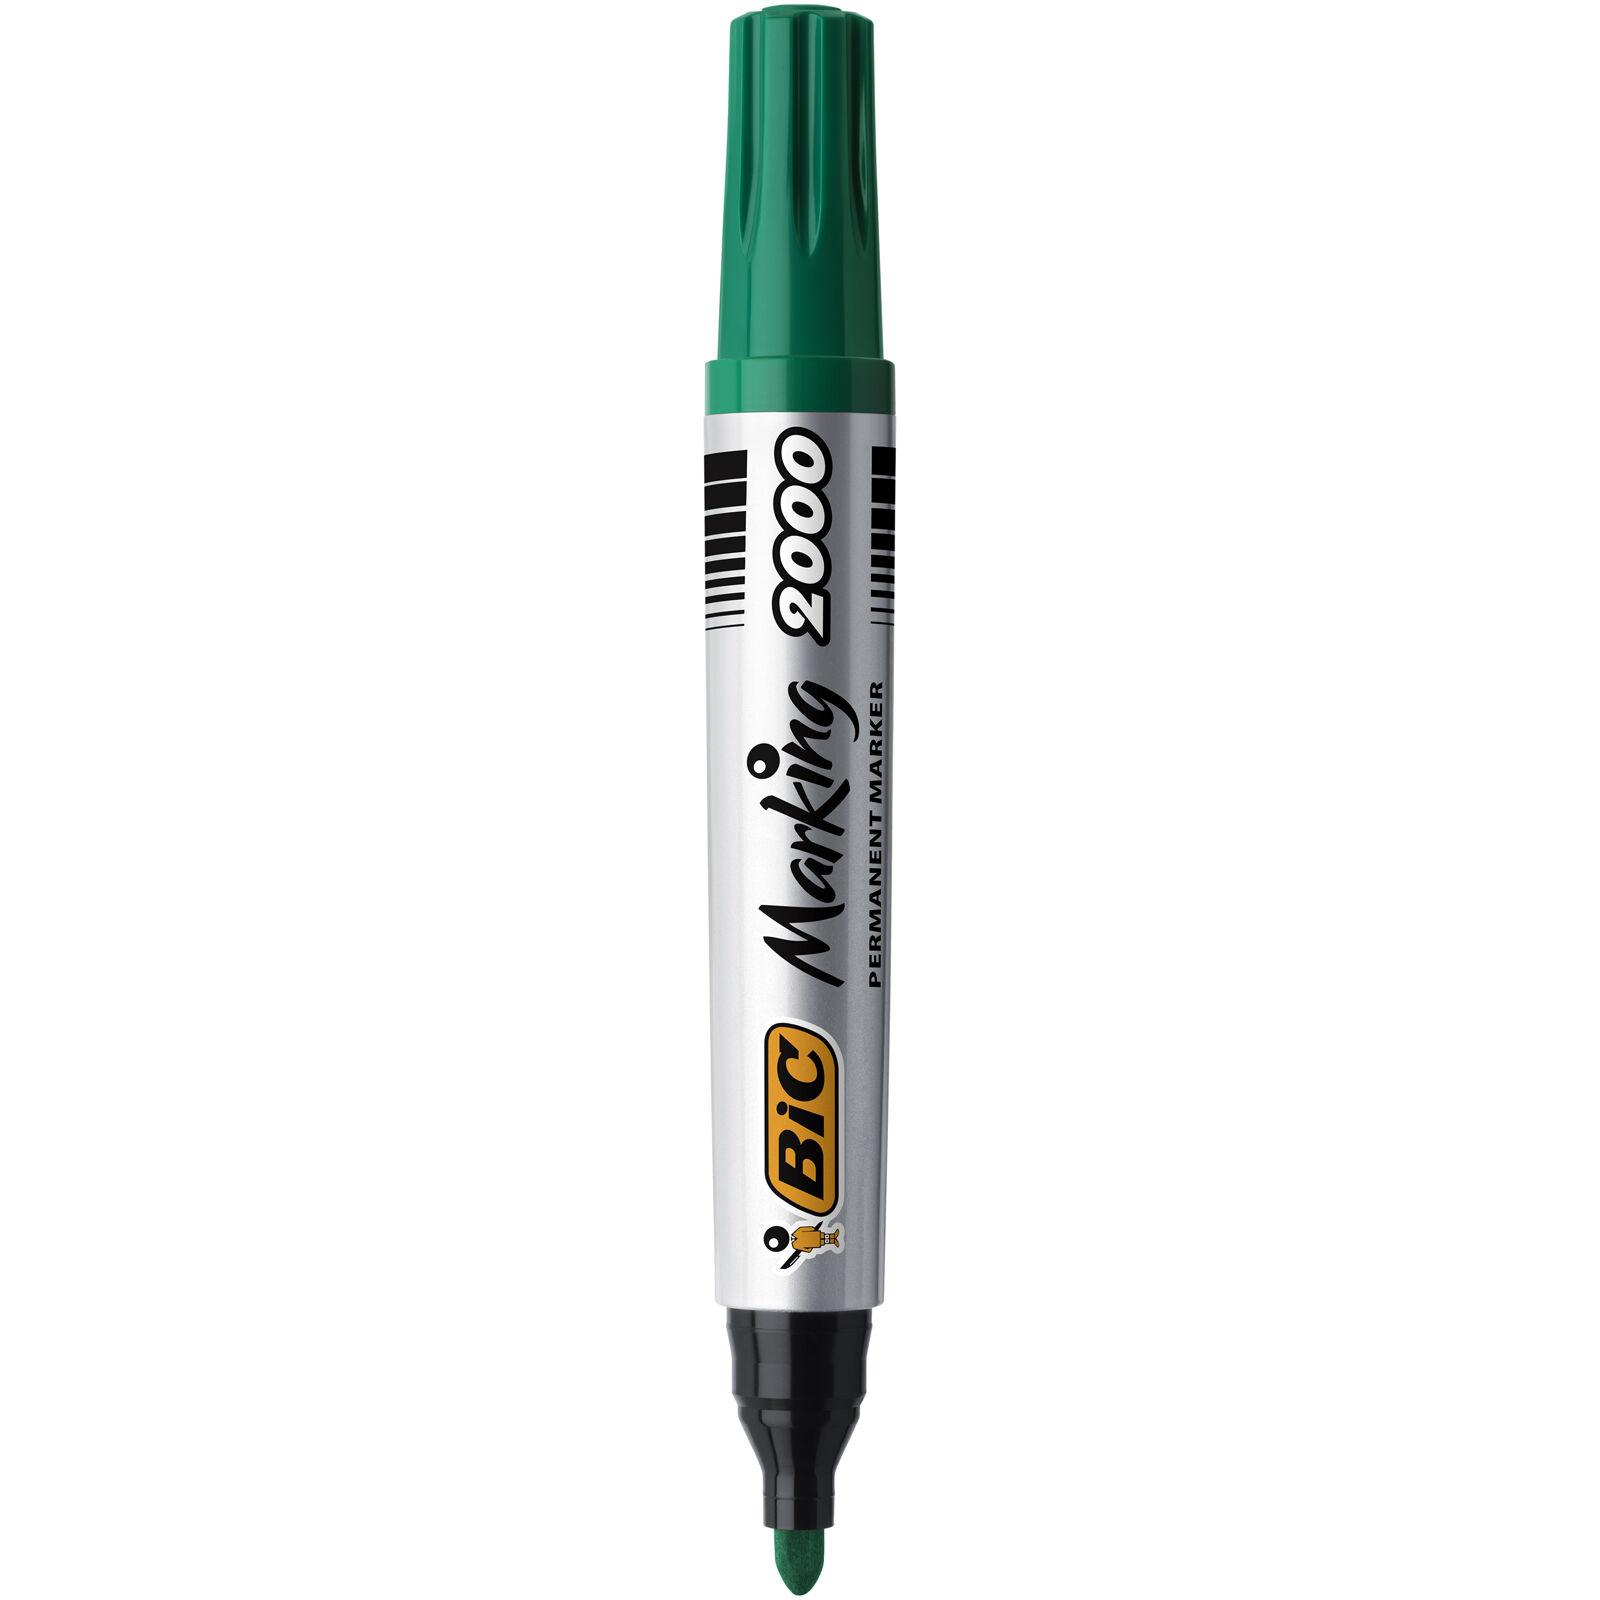 BIC MARKING 2000 Marqueur permanent pointe ogive vert